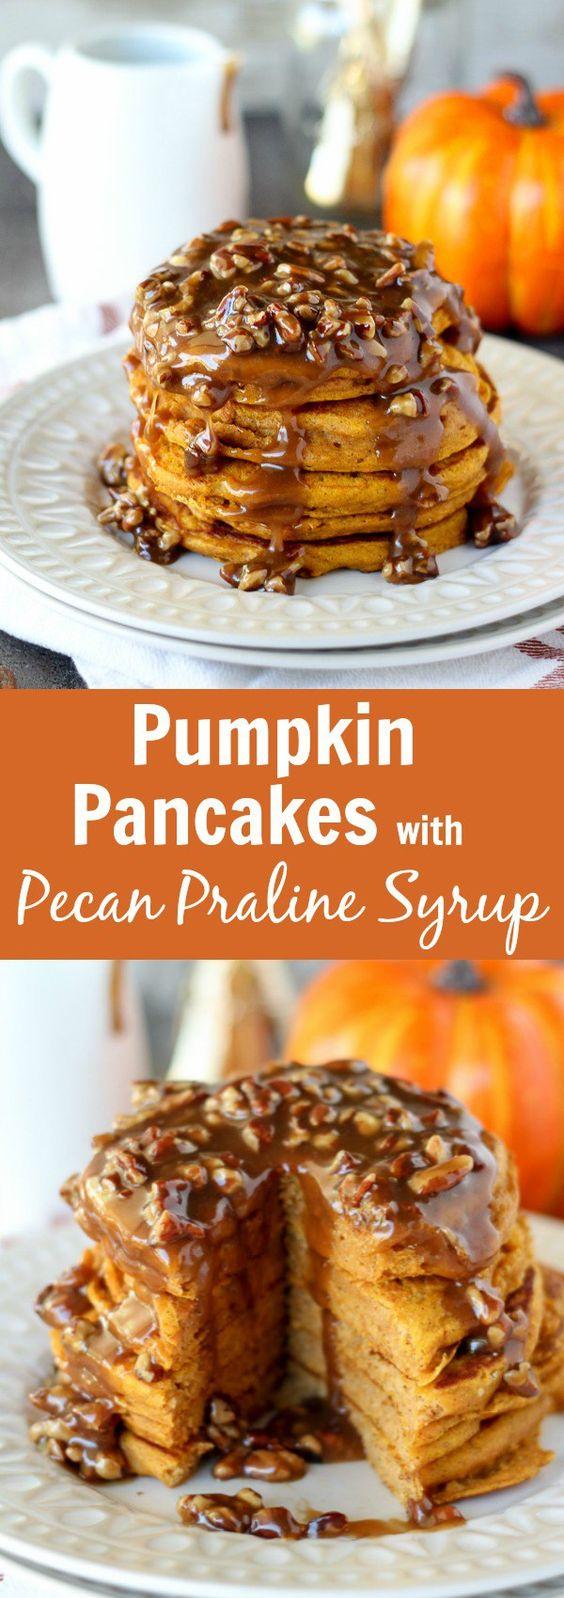 pancakes syrup pecans pancakes pumpkins cheese pumpkin pumpkin waffles ...